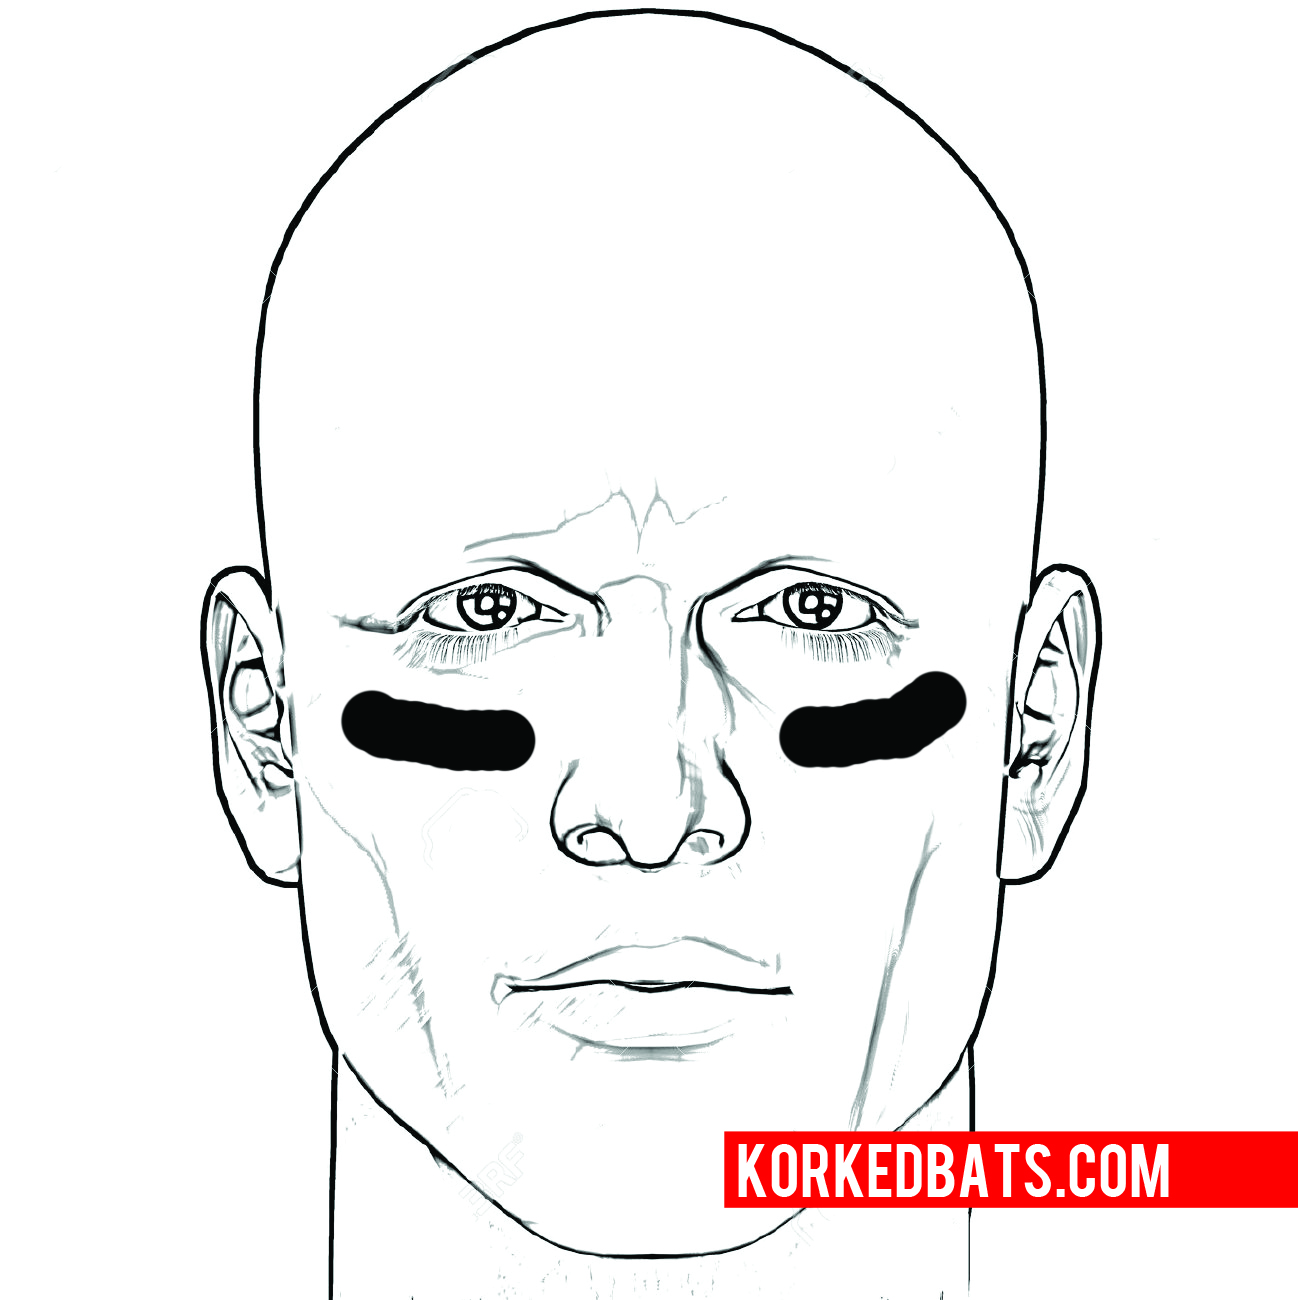 Intimidating eye black designs for baseball